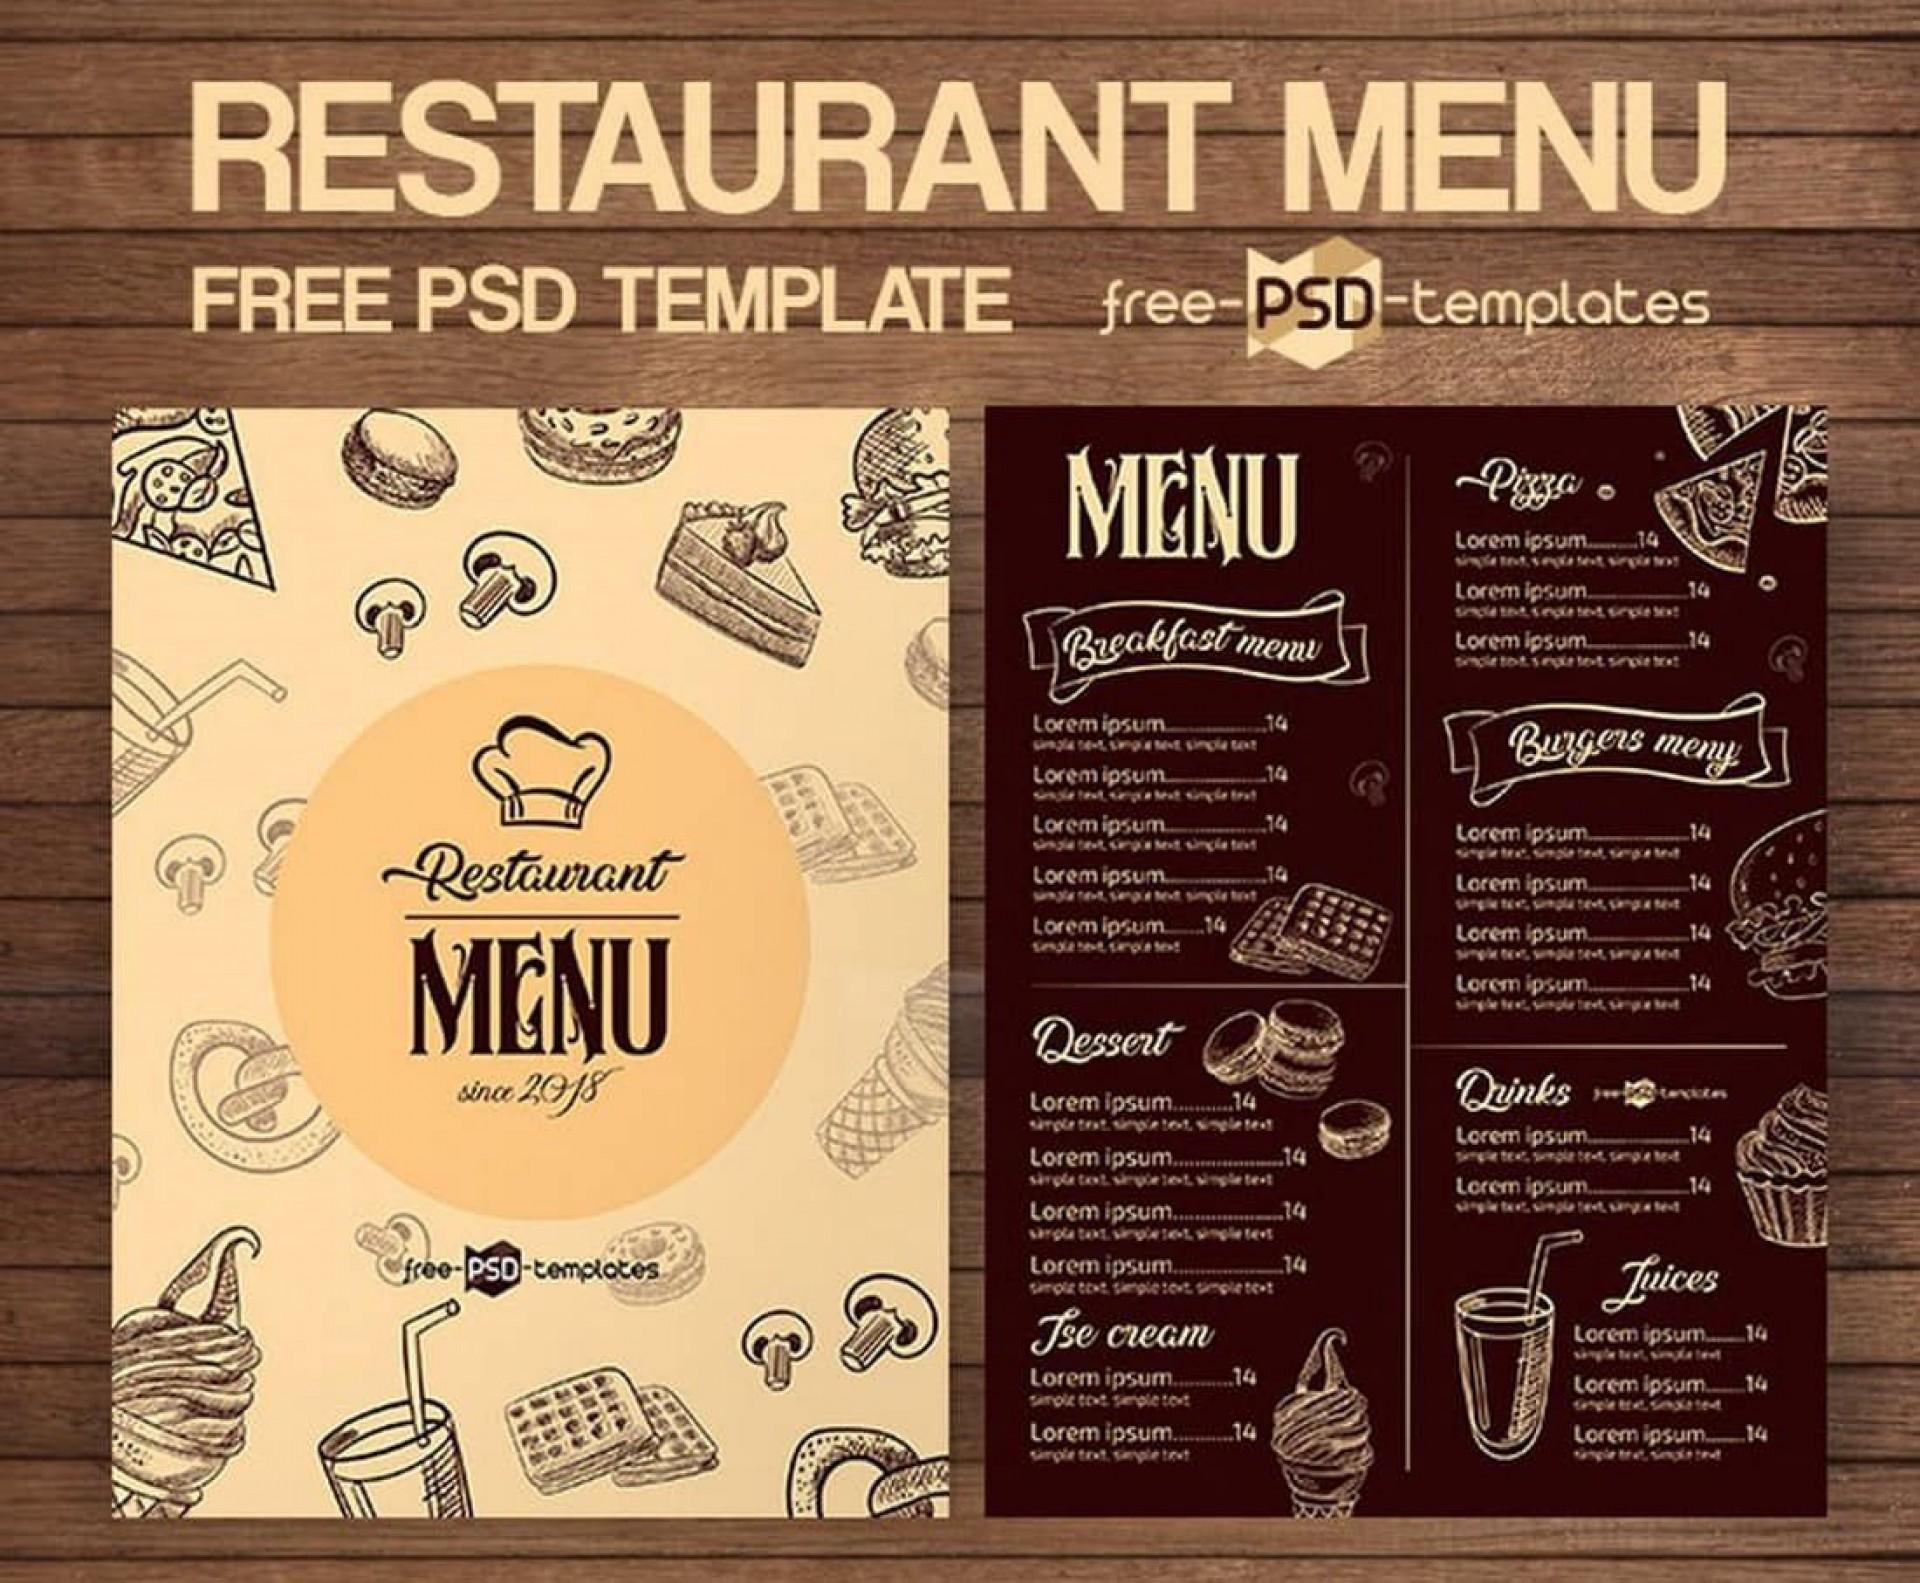 003 Formidable Restaurant Menu Template Free Download Psd High Definition  Design1920